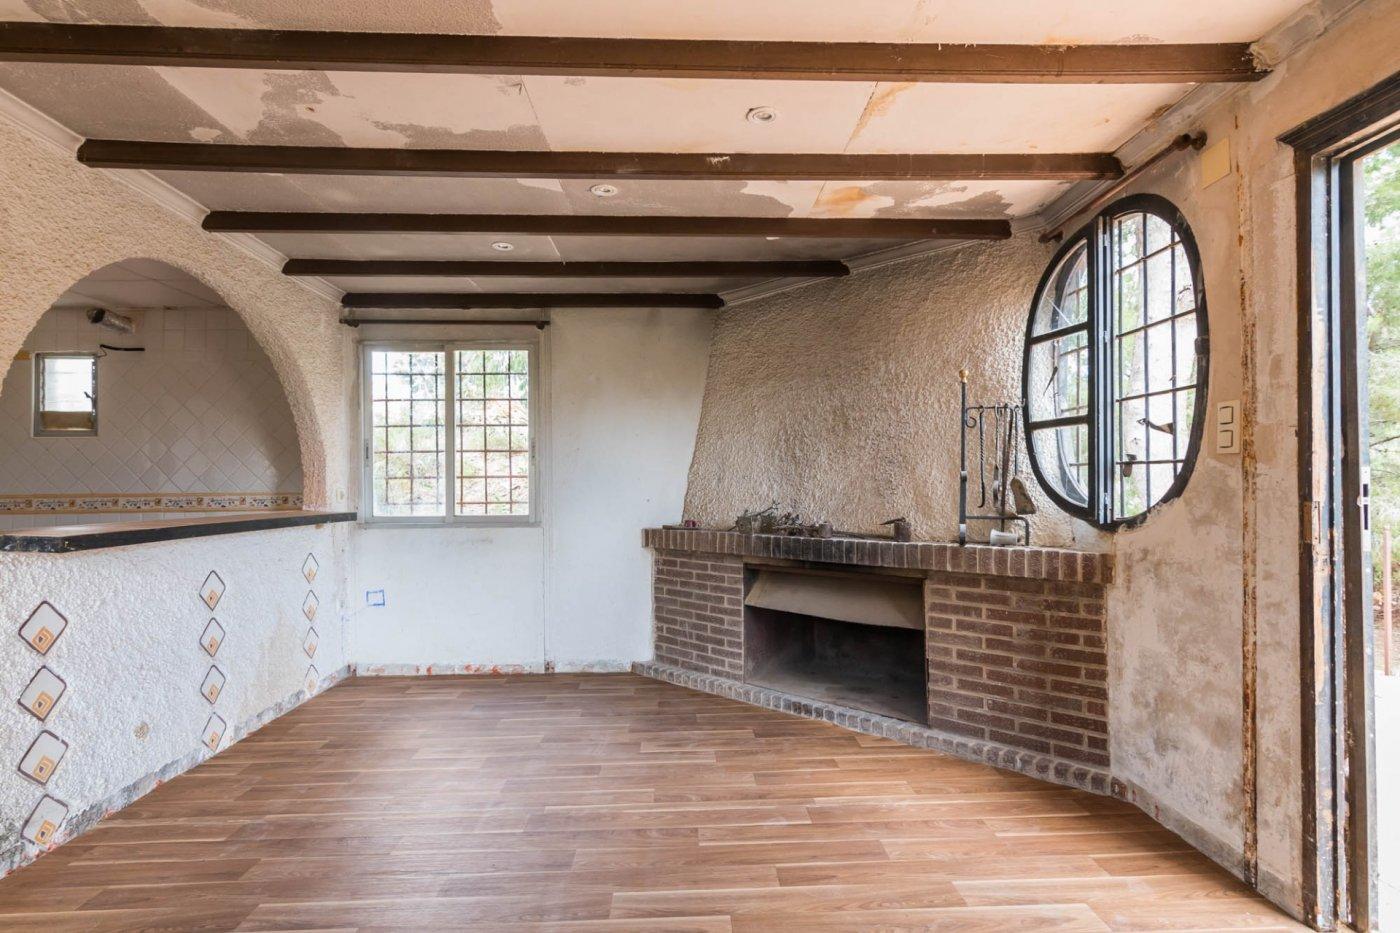 Casa Con Terreno · Murcia · San Jose De La Montaña 129.000€€